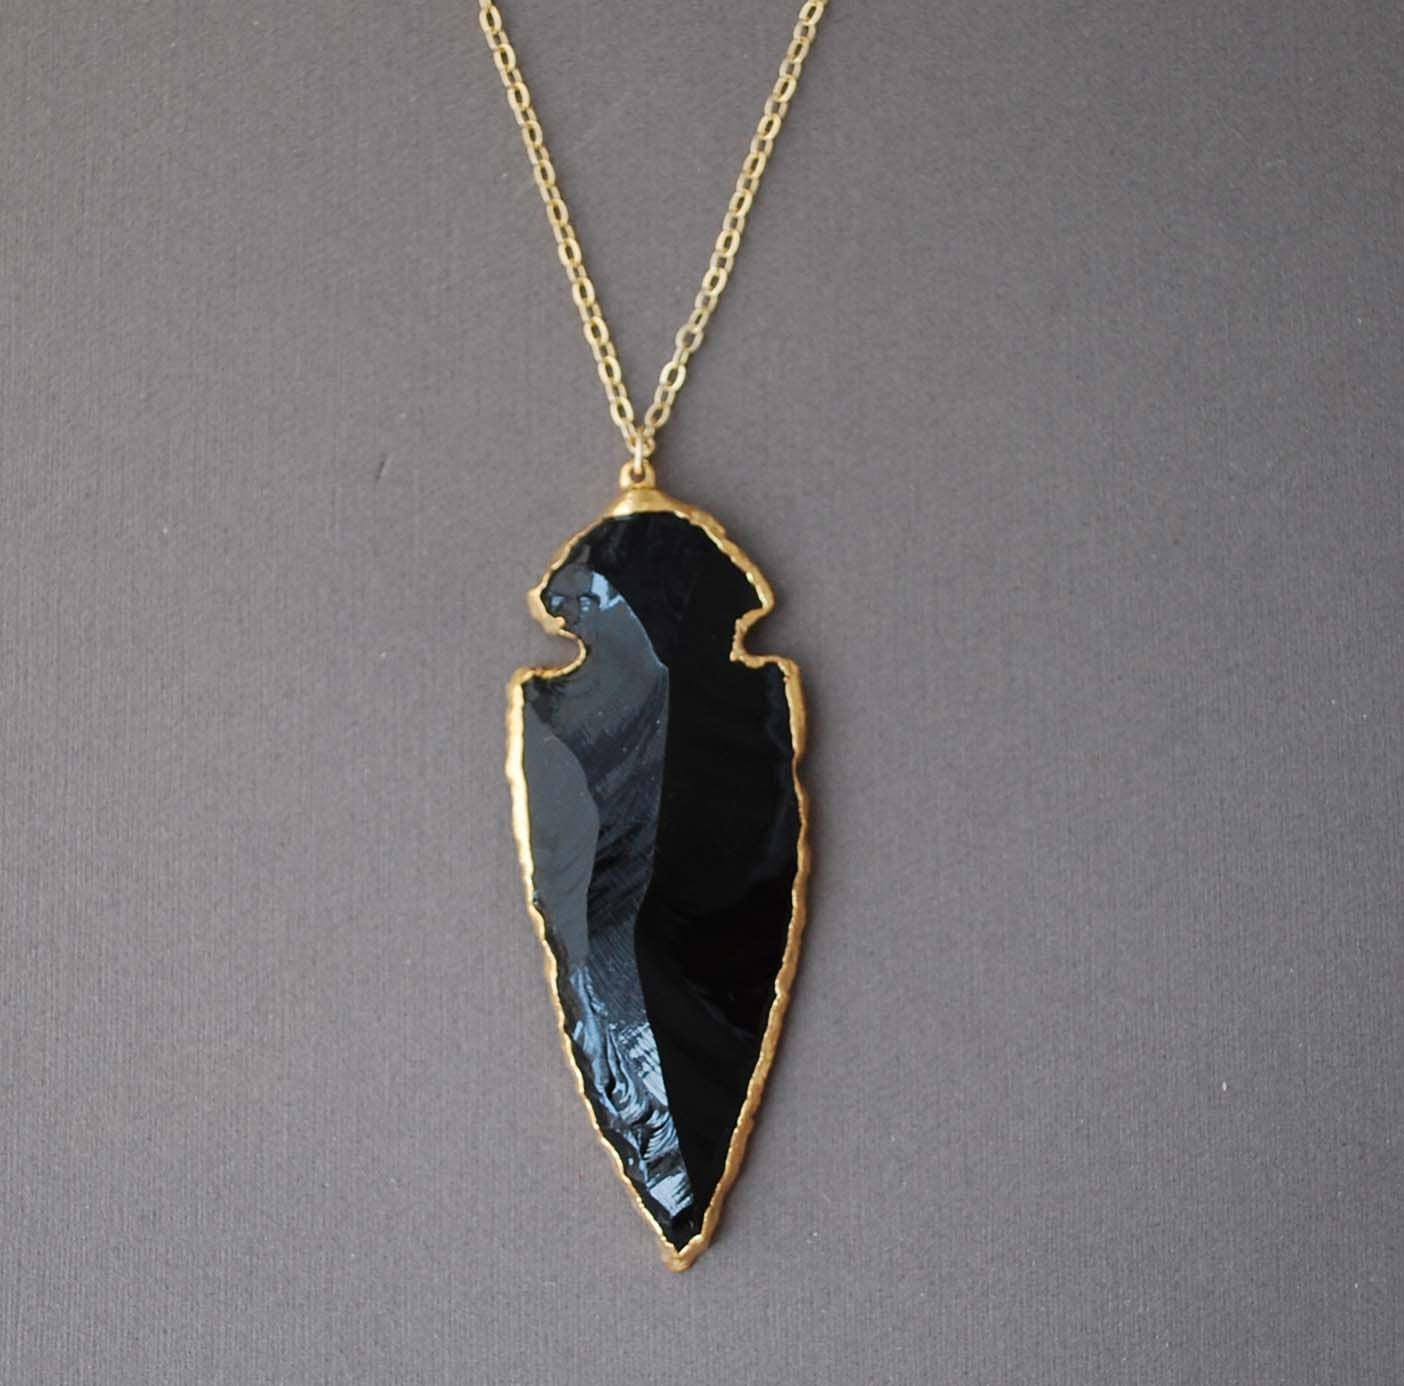 30 black obsidian arrowhead gold necklace